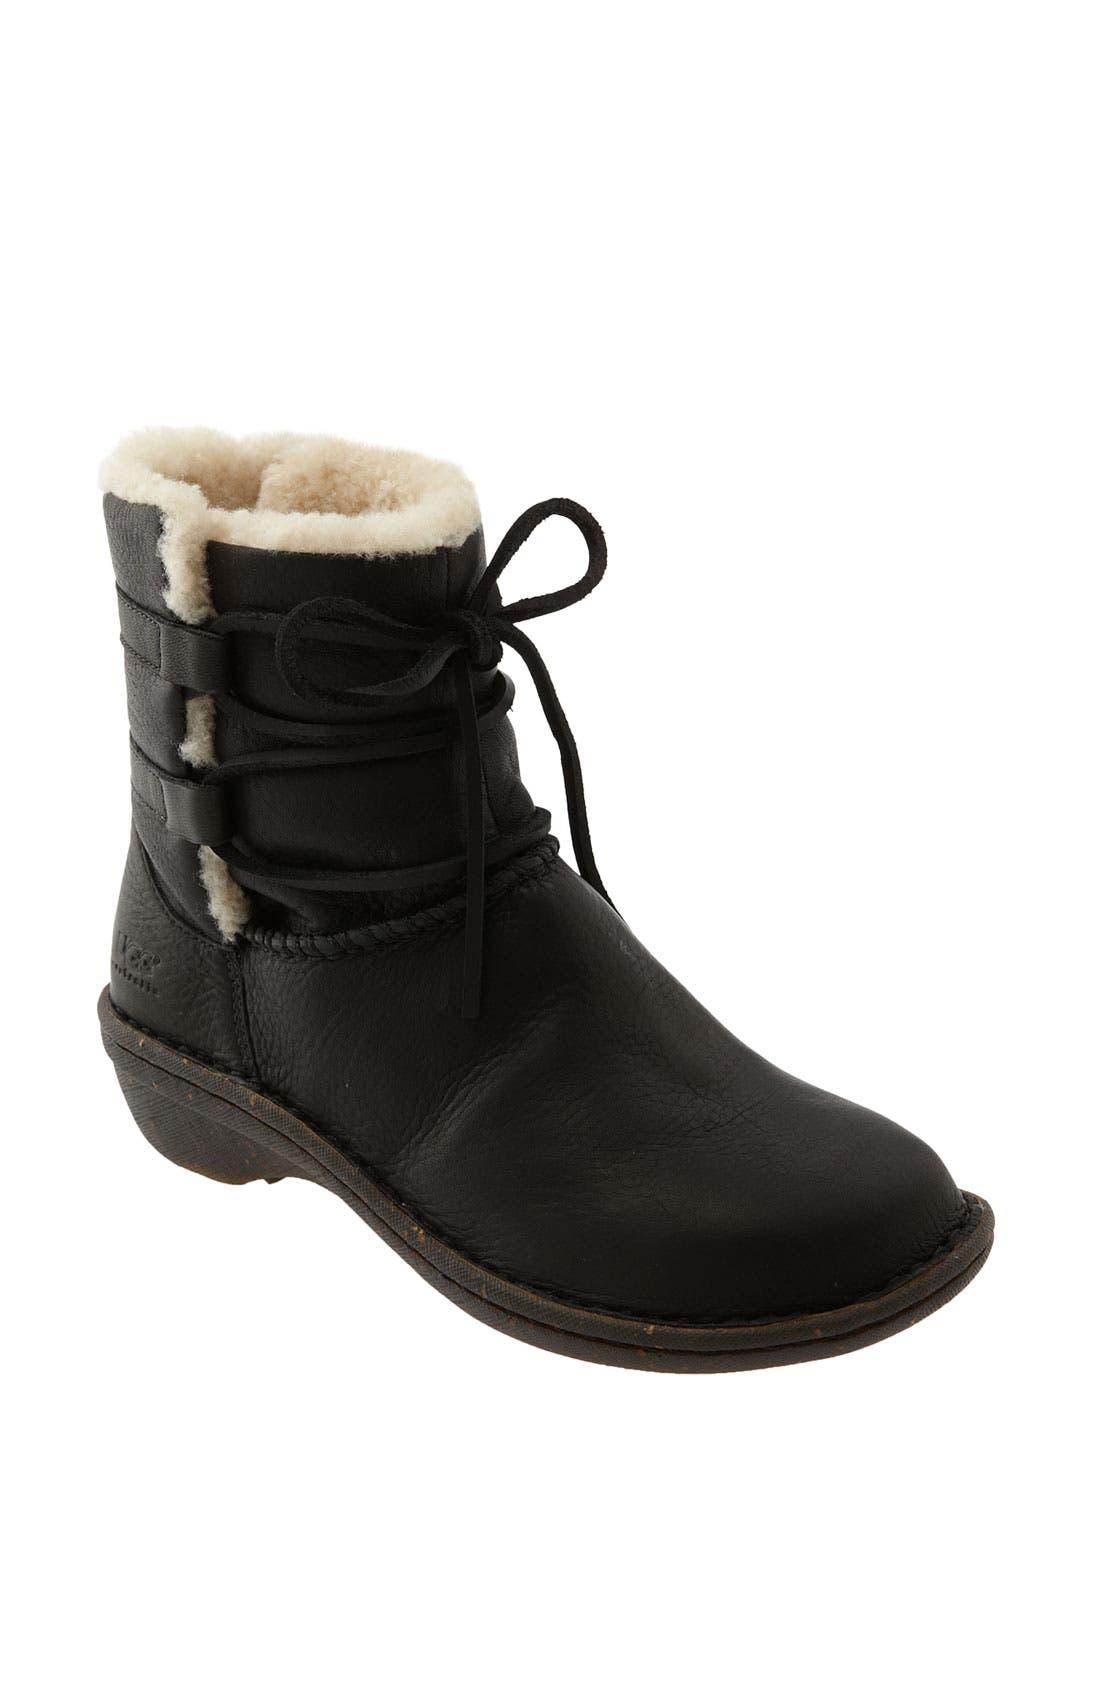 Alternate Image 1 Selected - UGG® Australia 'Caspia' Boot